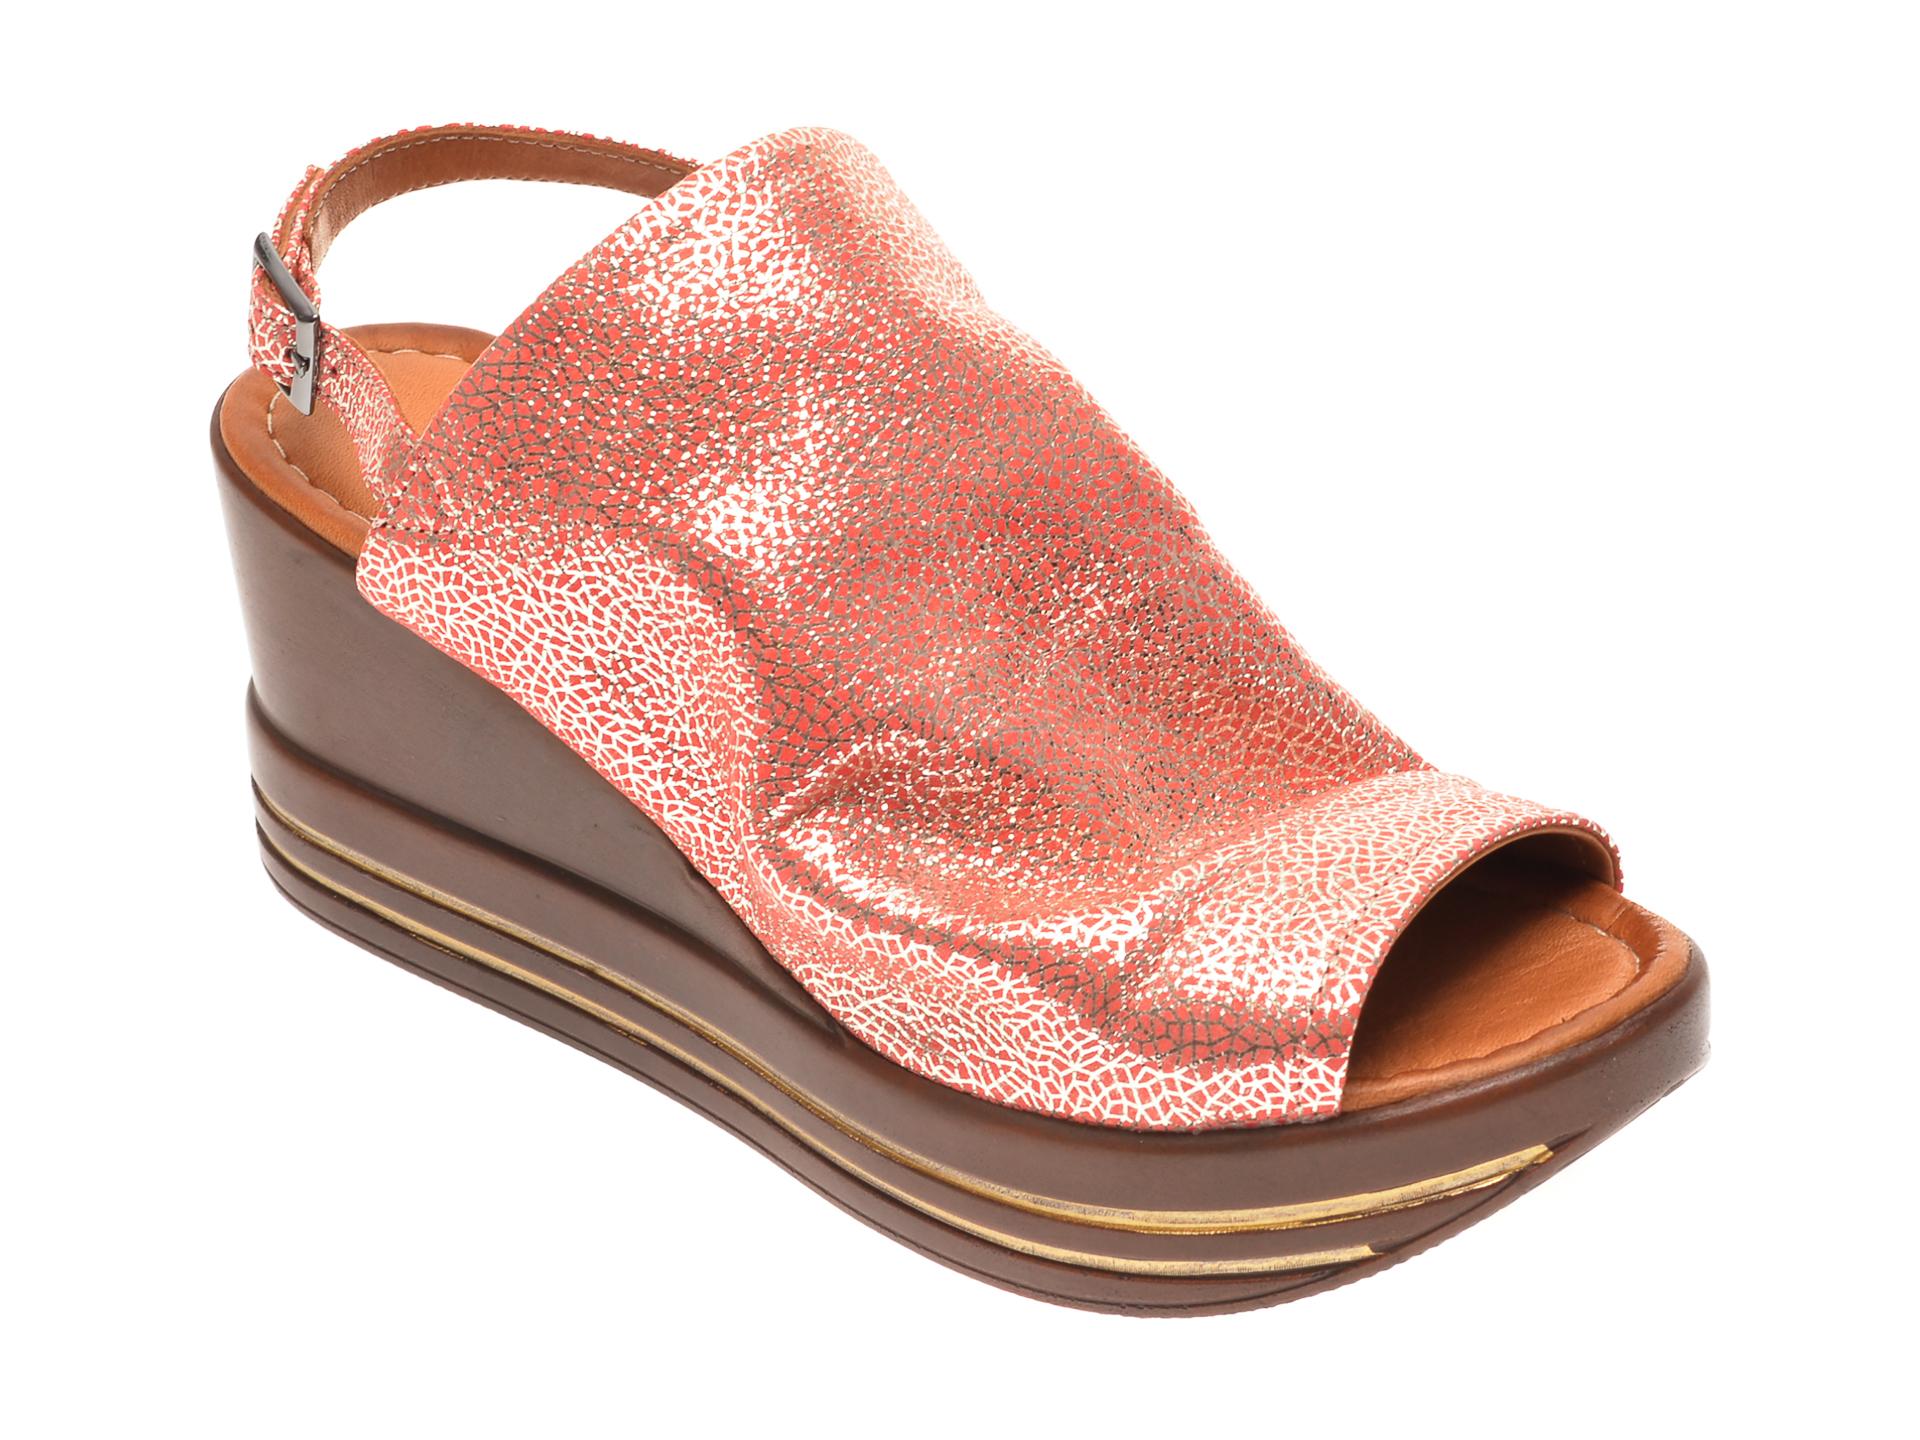 Sandale FLAVIA PASSINI roz, 1182725, din piele naturala